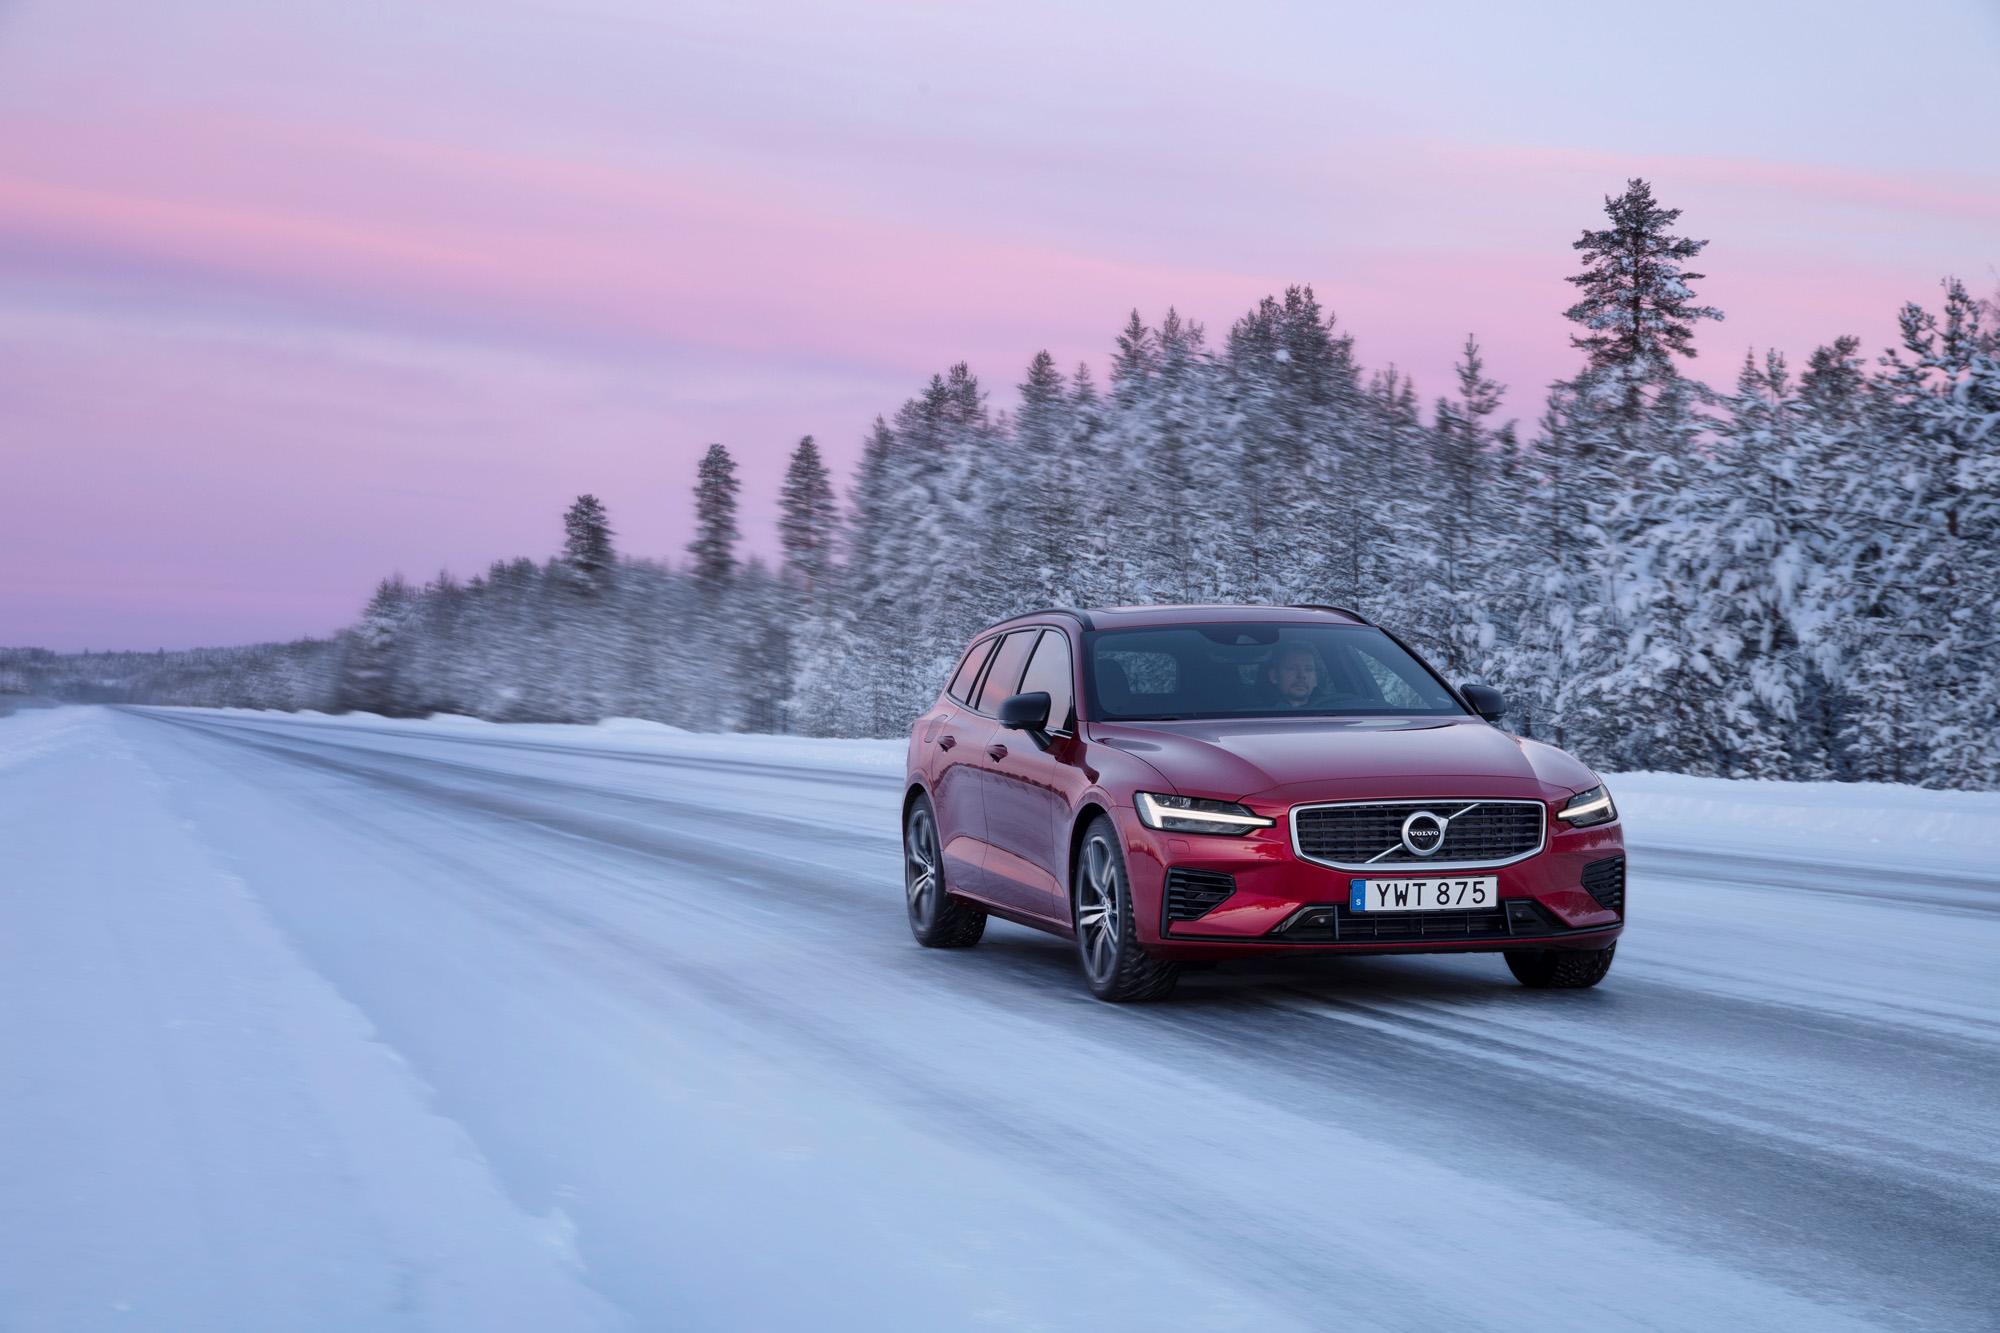 Volvo V60 on a snowy road